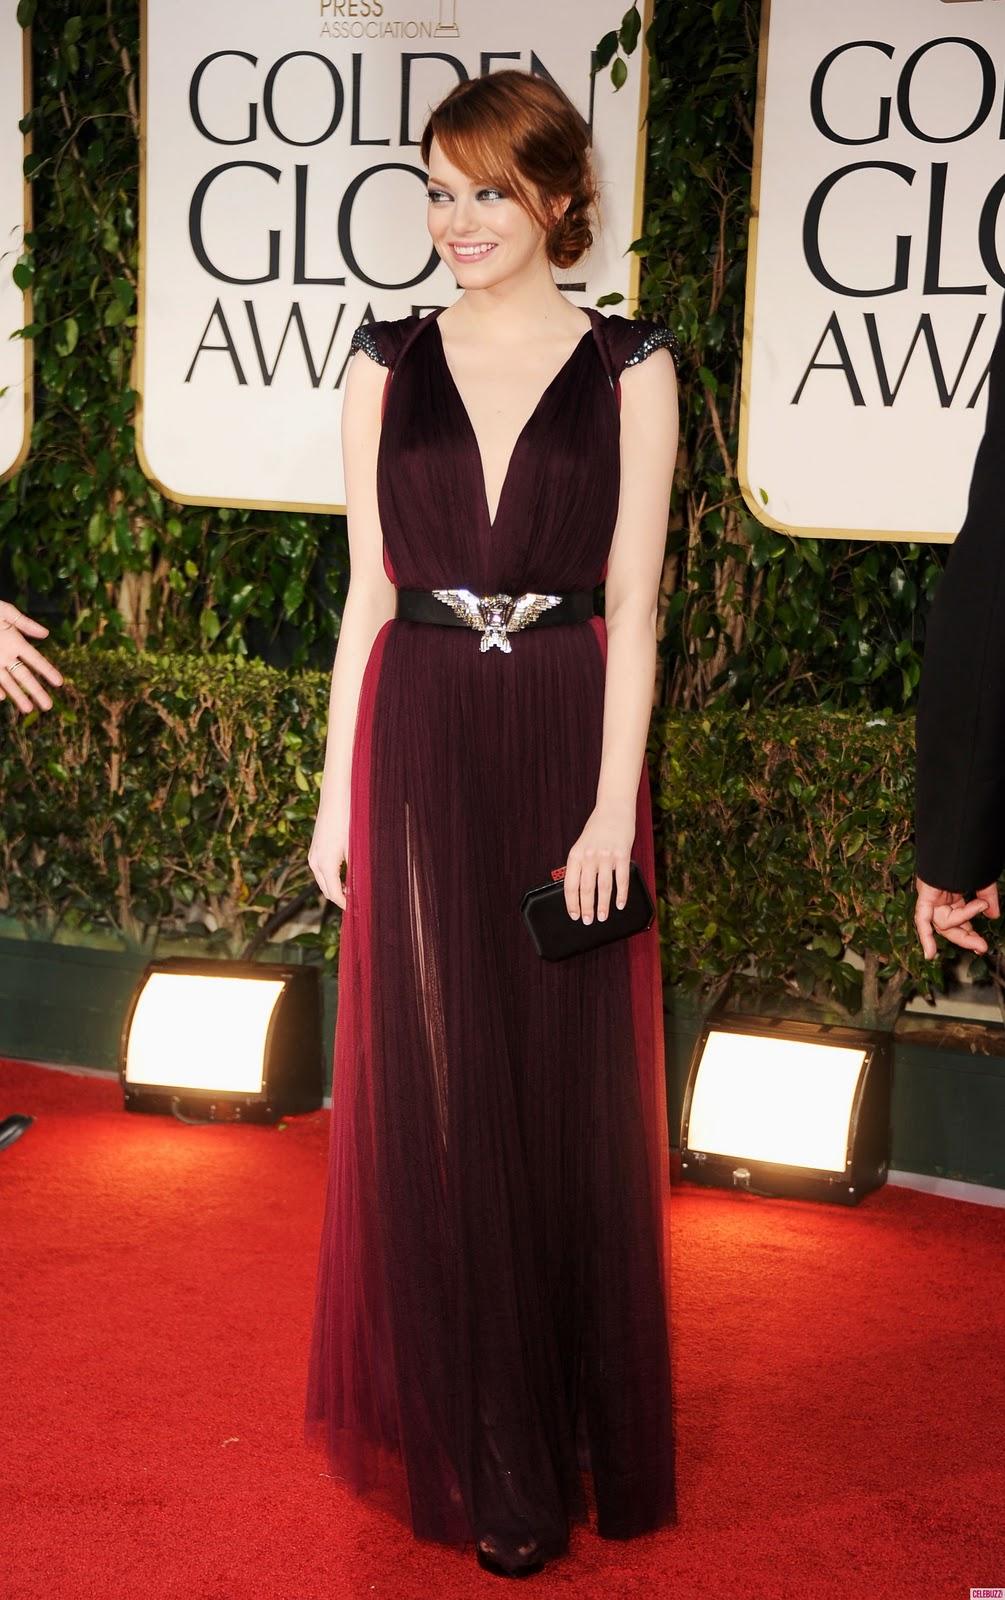 Fashion Blog: 2012 Golden Globes Award  Emma Stone Golden Globes